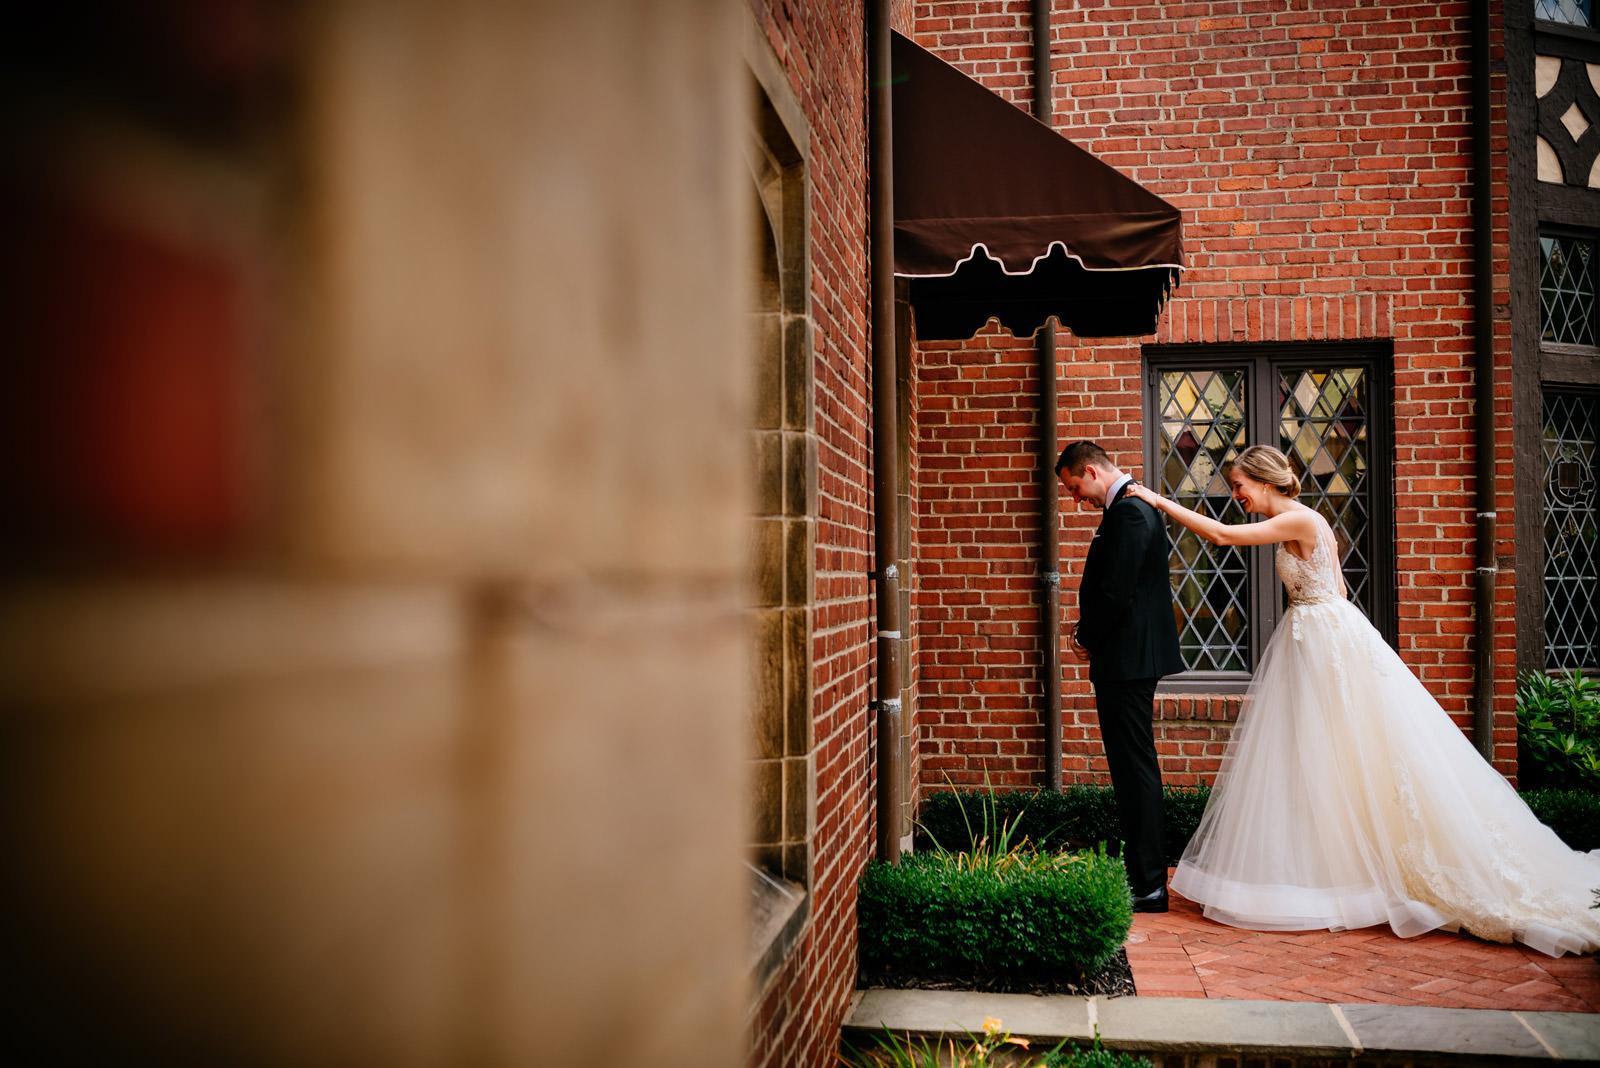 bride groom first look zenner house wedding athens ohio